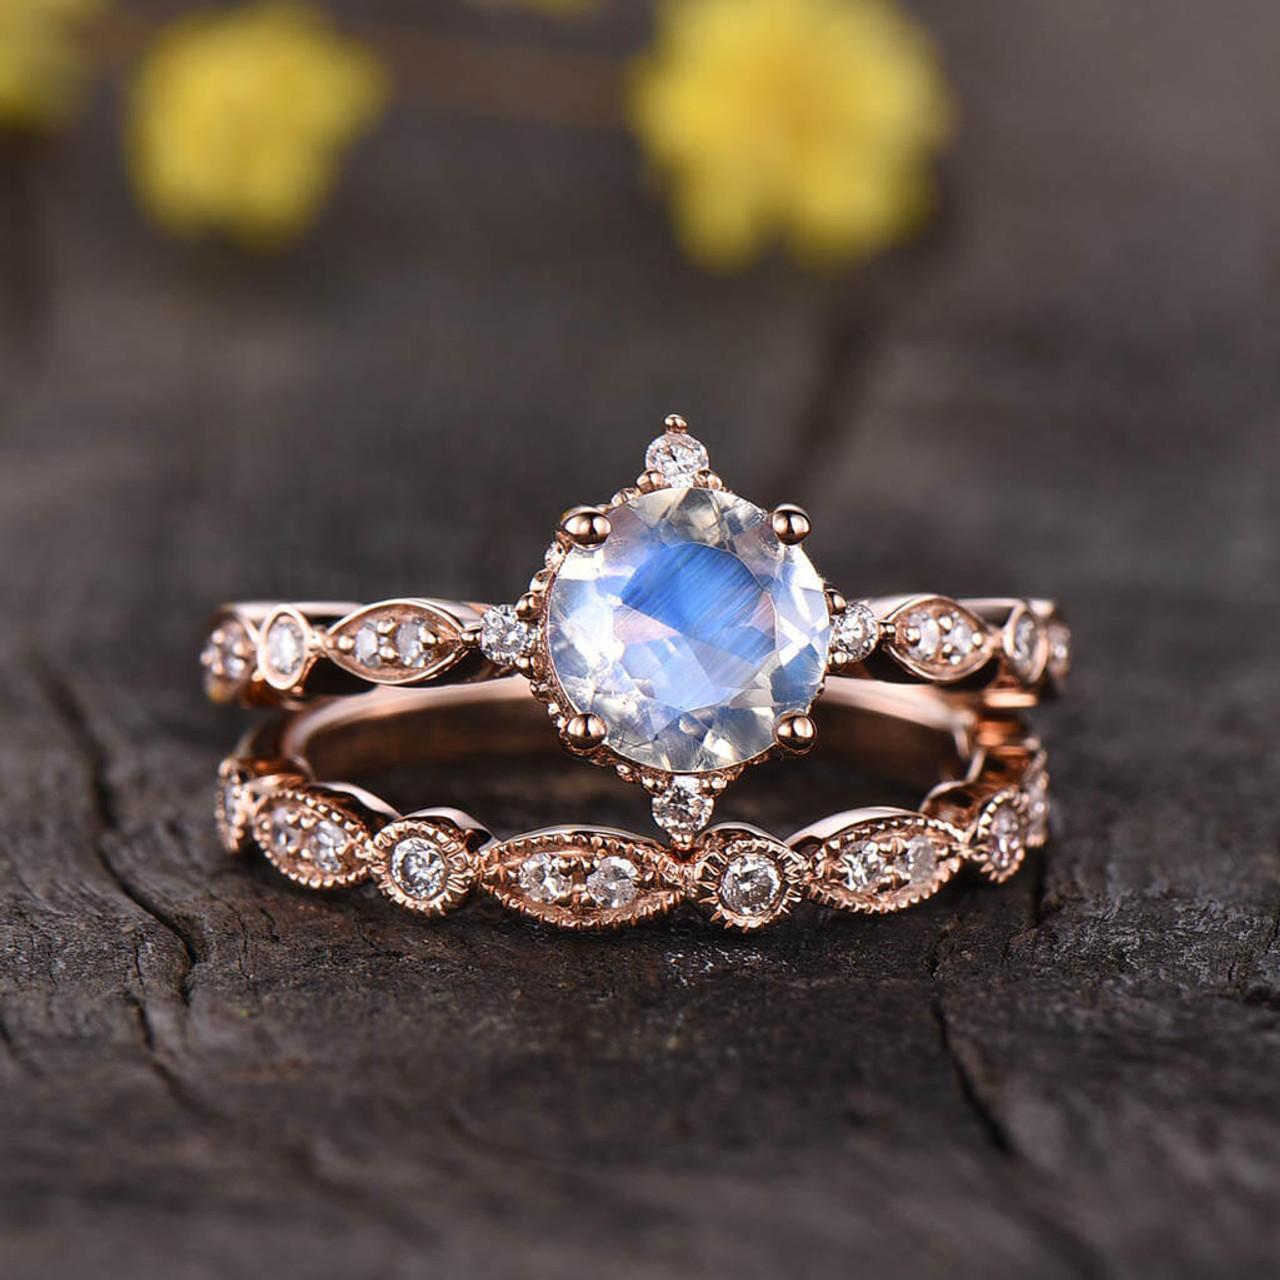 Moonstone Diamond Rose Gold Engagement Ring Set Vintage Art Deco 2pcs Bbbgem